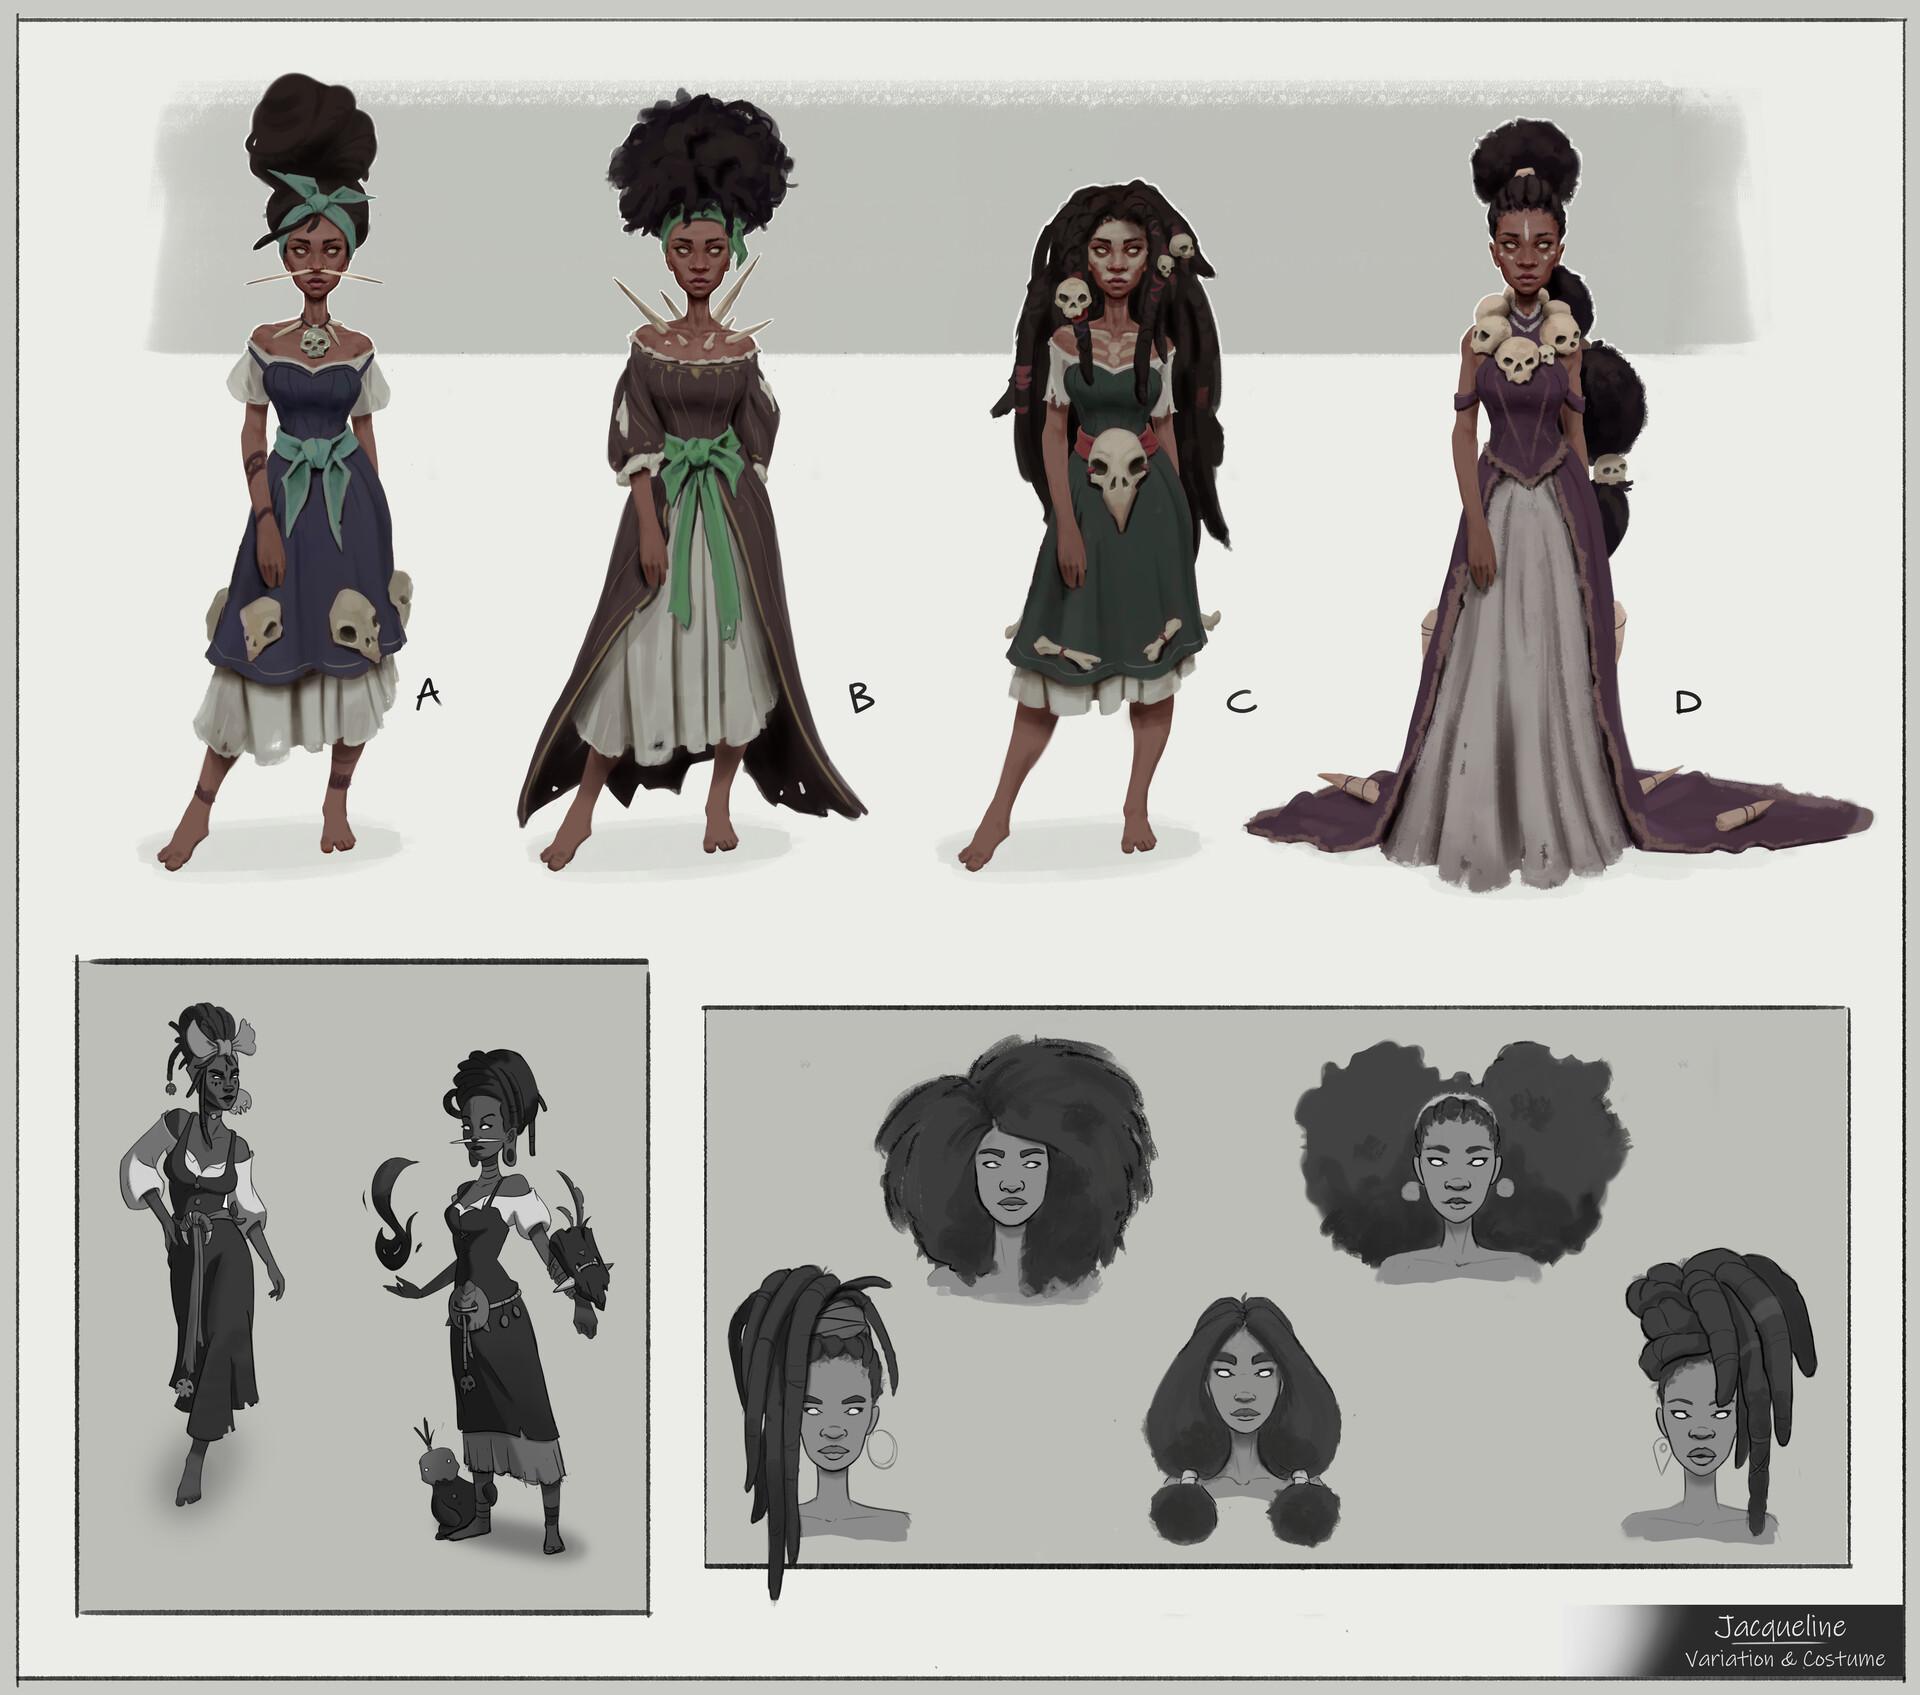 Variation and costume design.